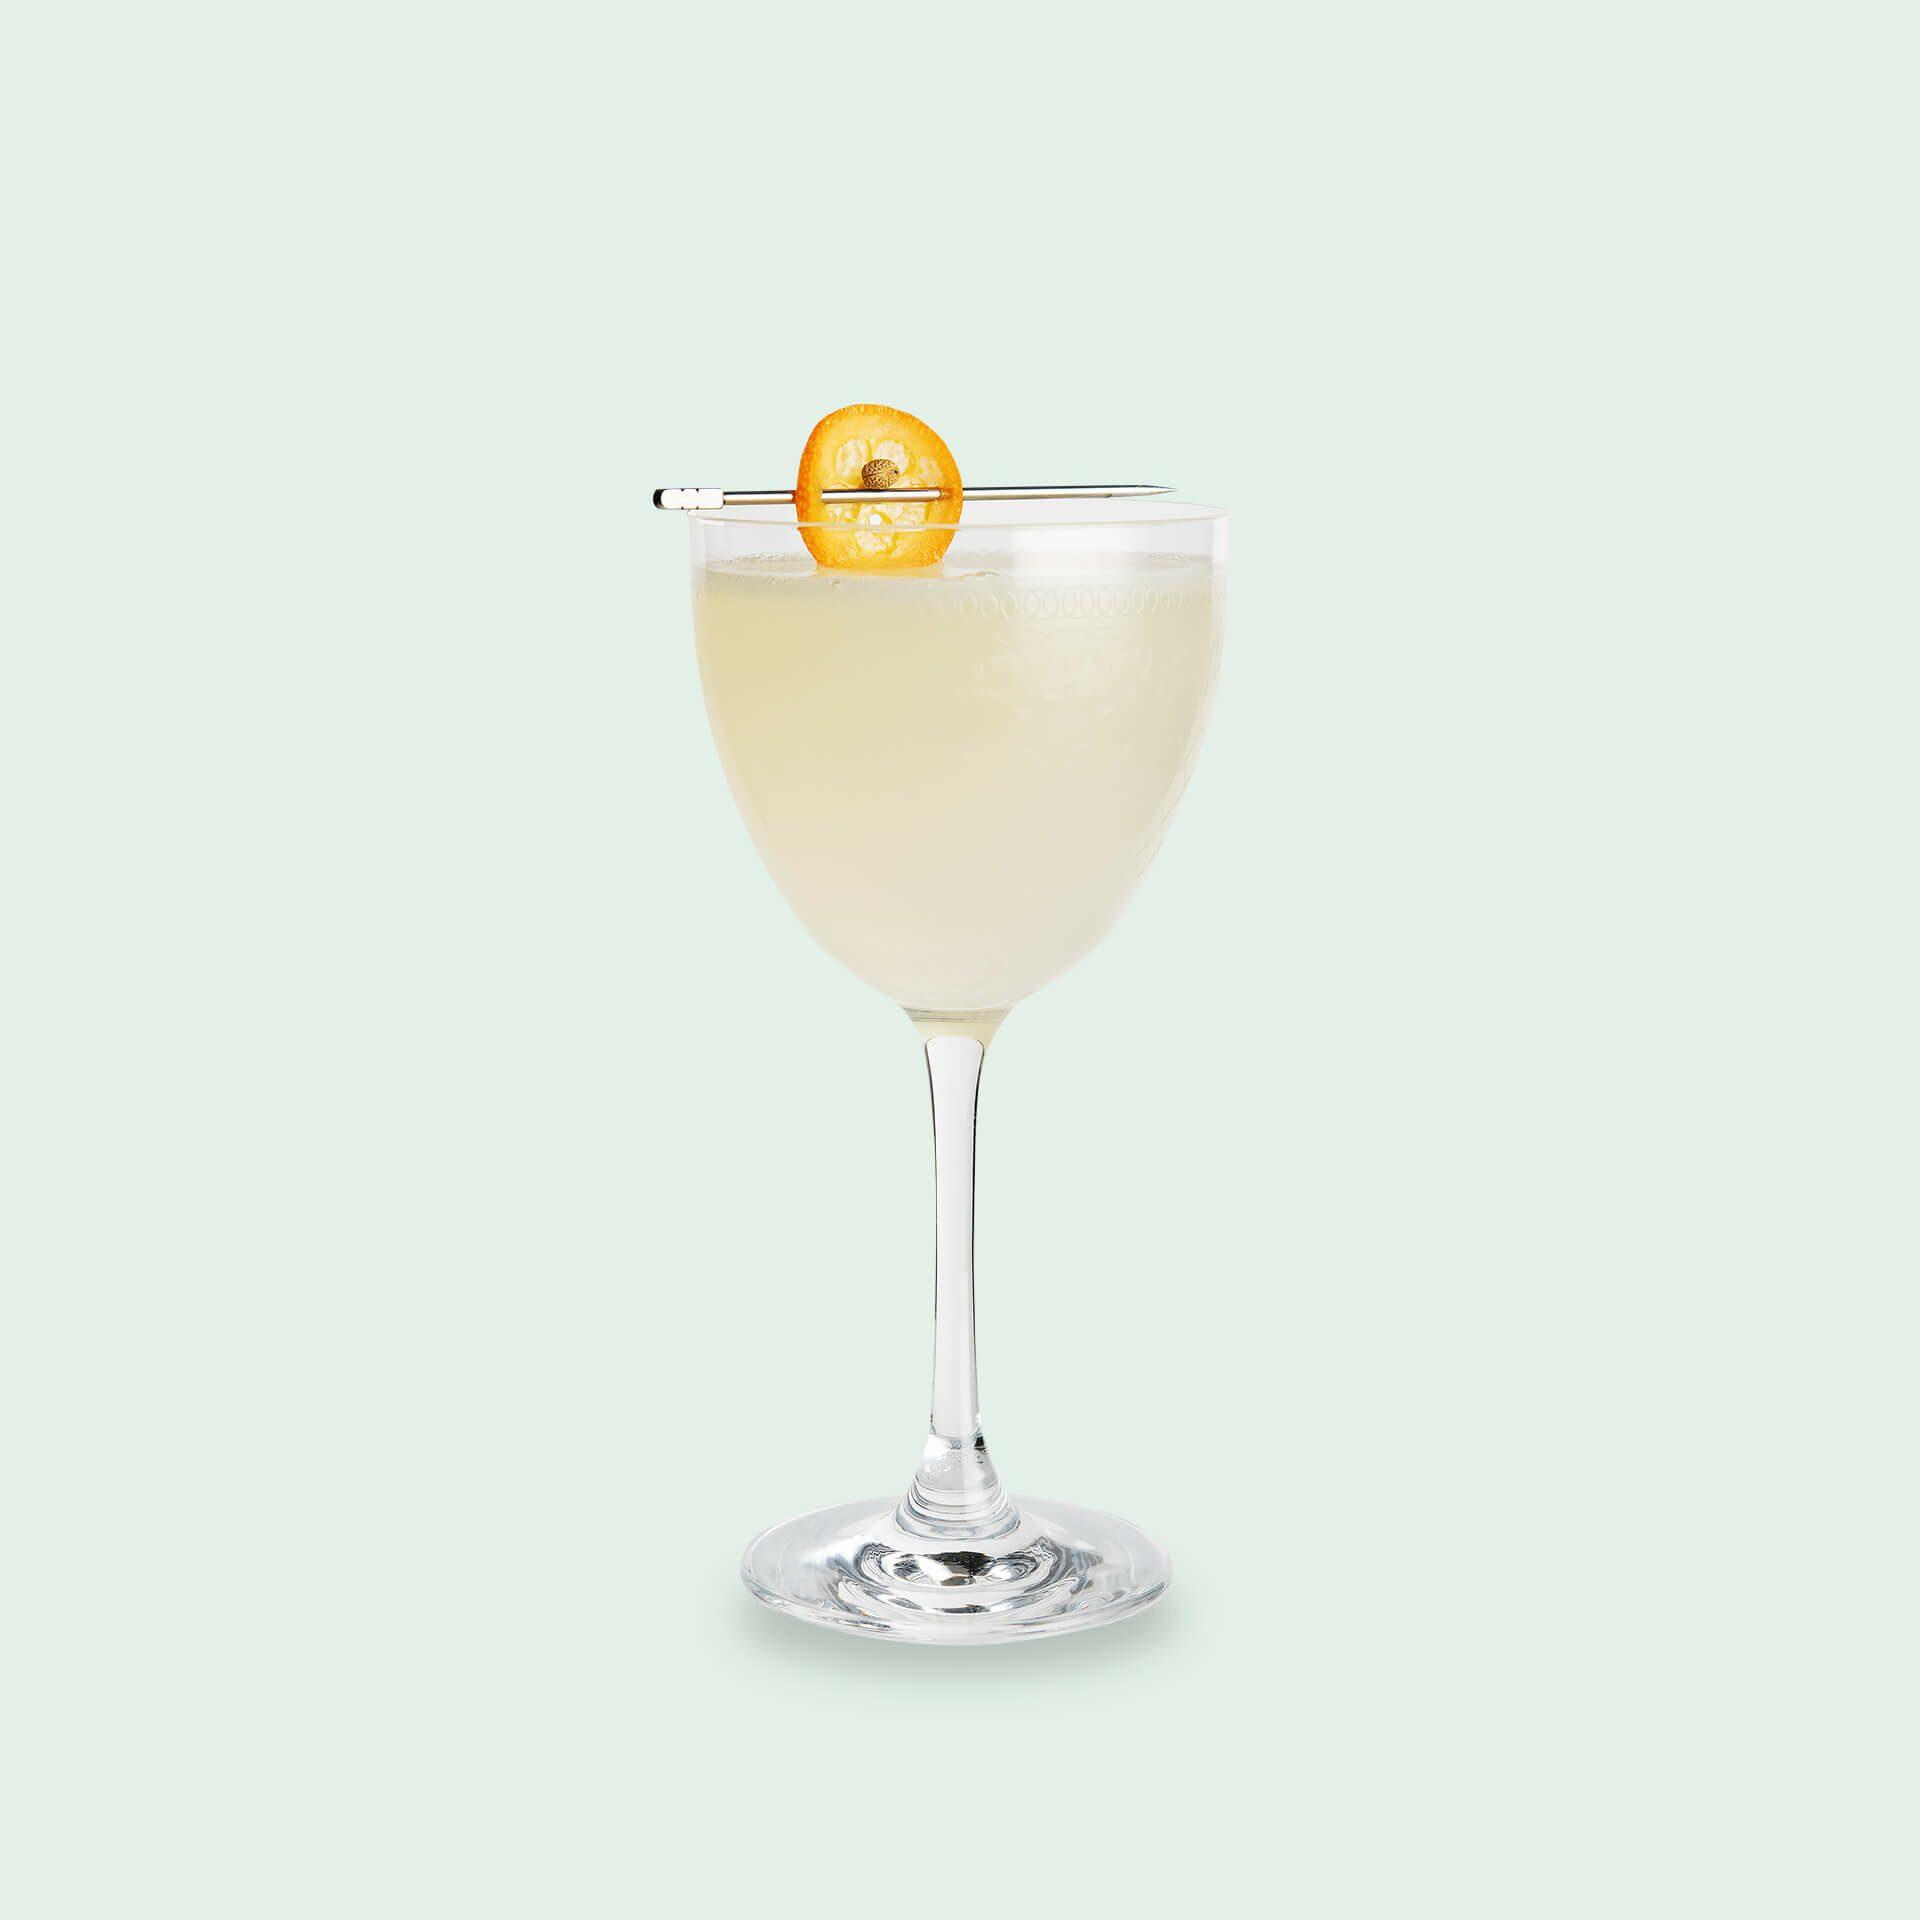 Shunga Japanischer Cocktail im Drink Syndikat Cocktail Set